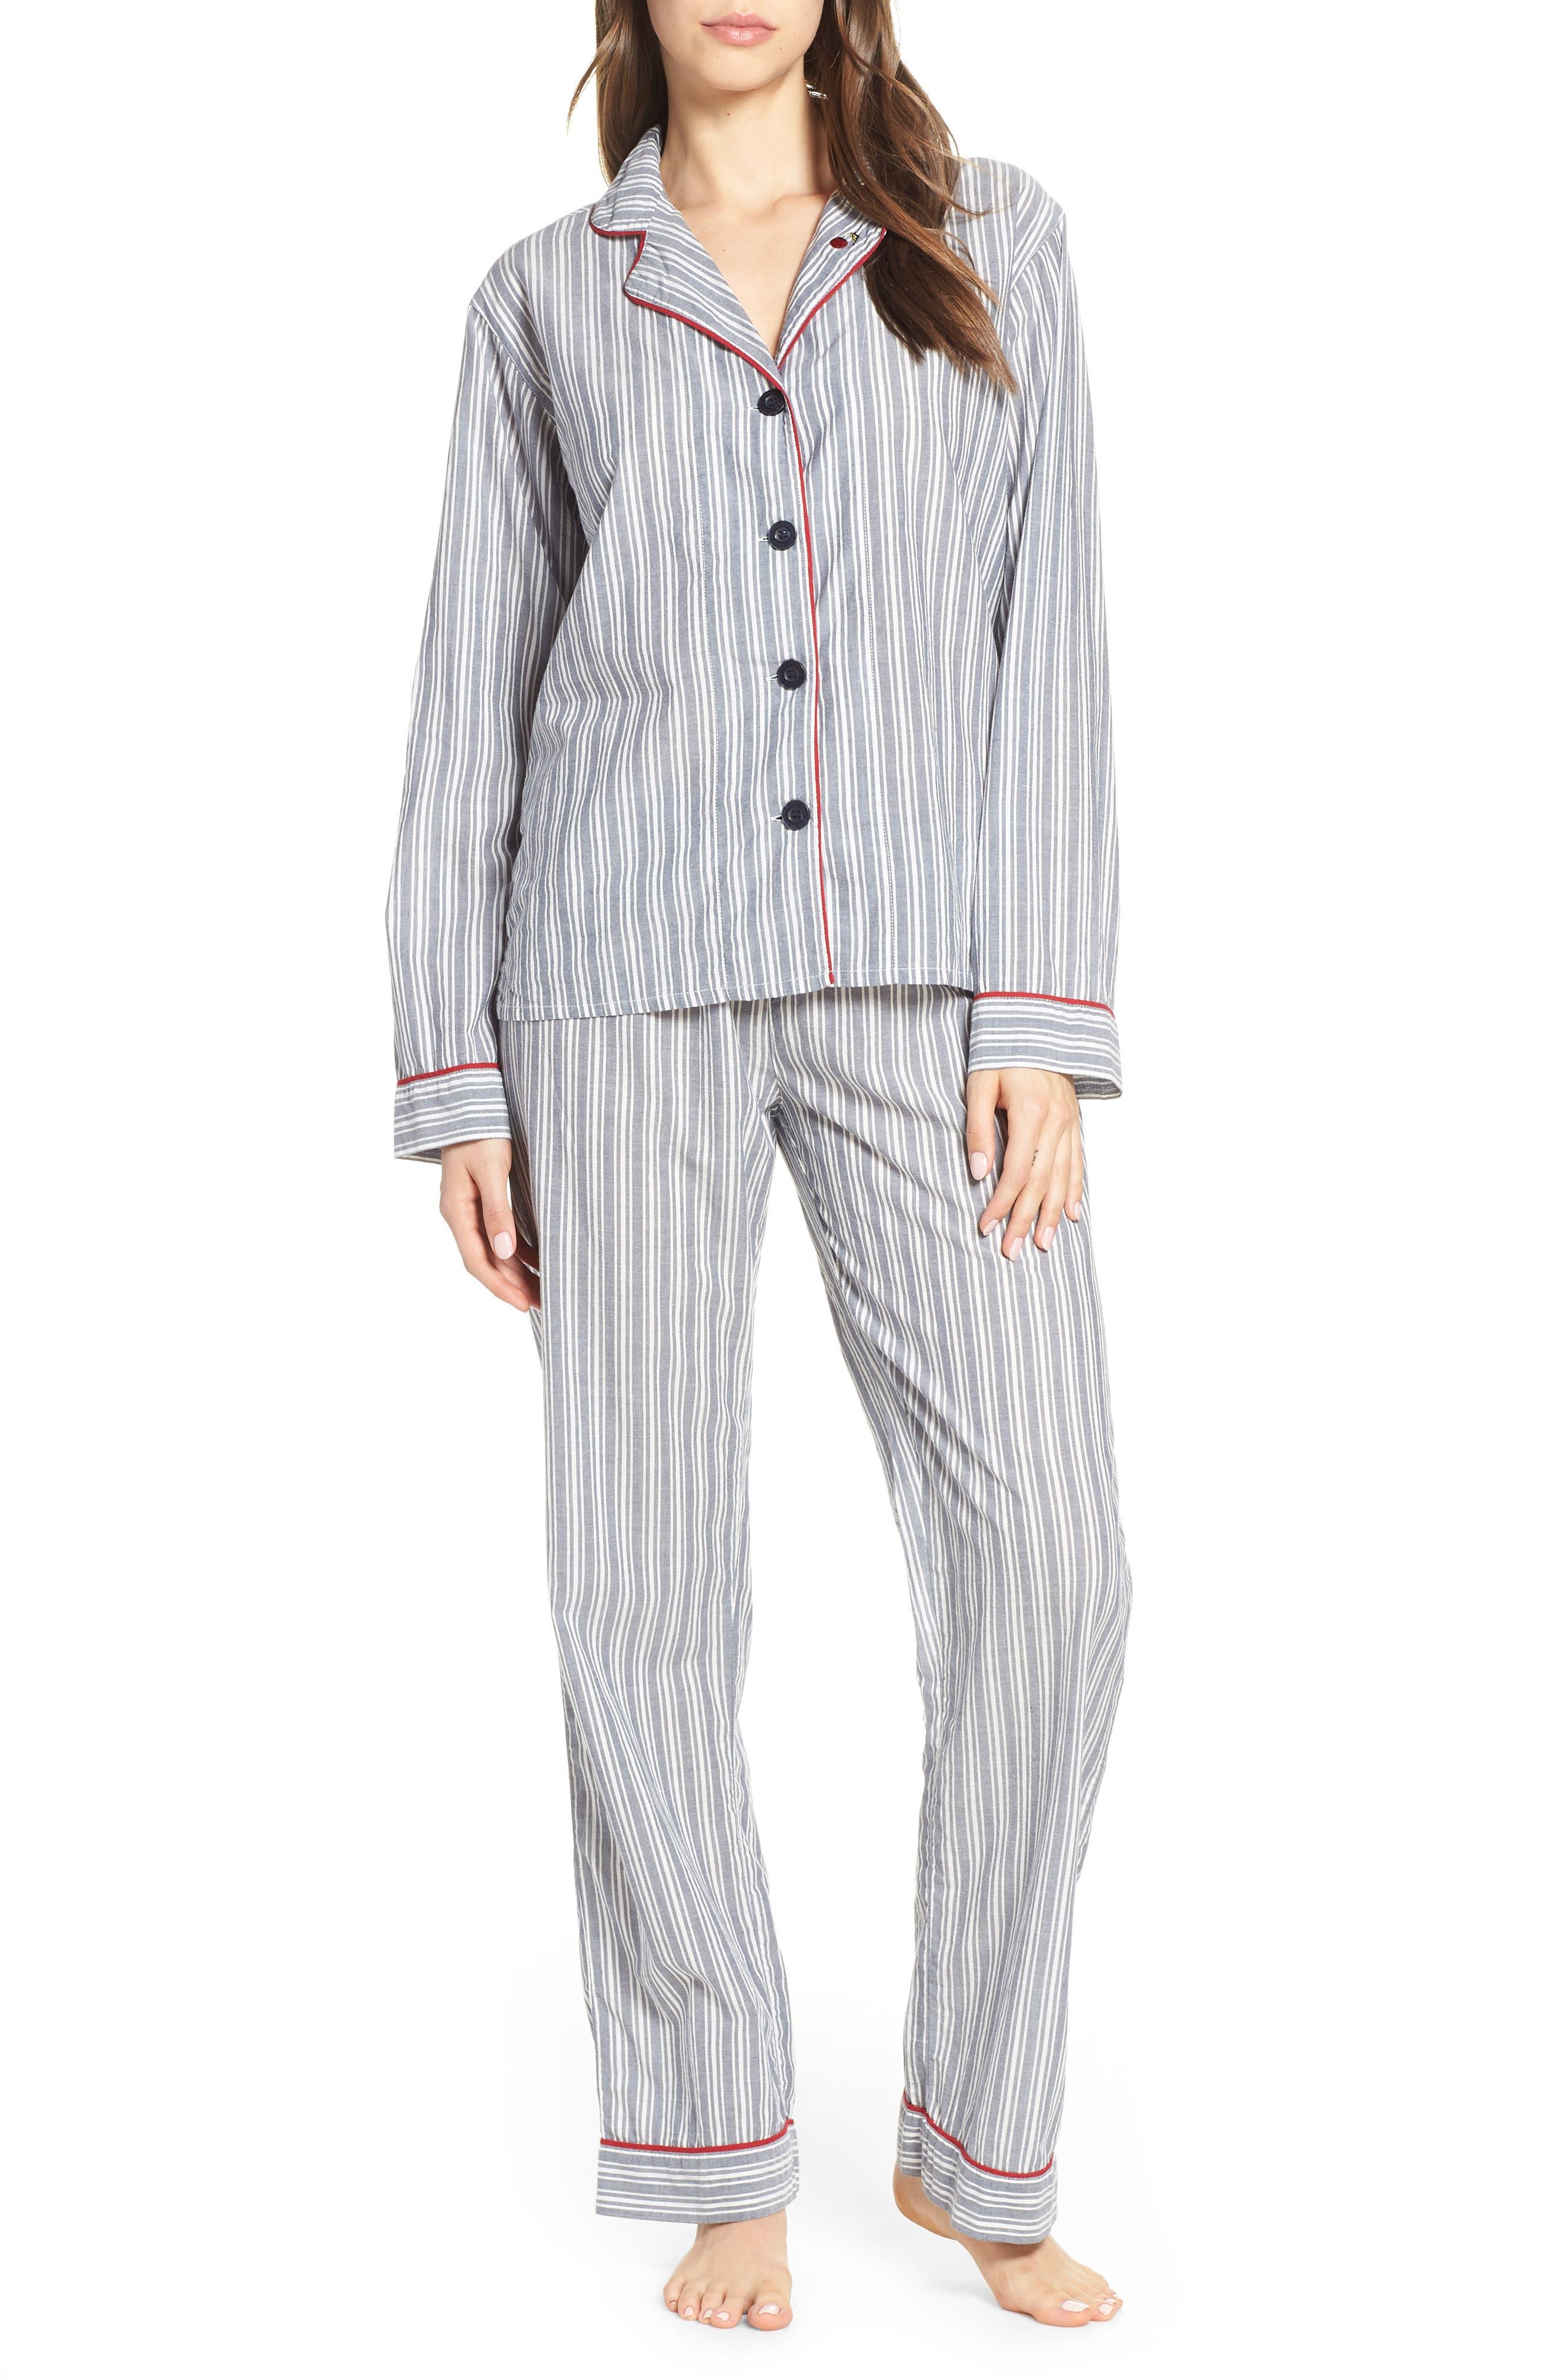 PJ SALVAGE, Mon Cheri Pajamas, Main thumbnail 1, color, DENIM